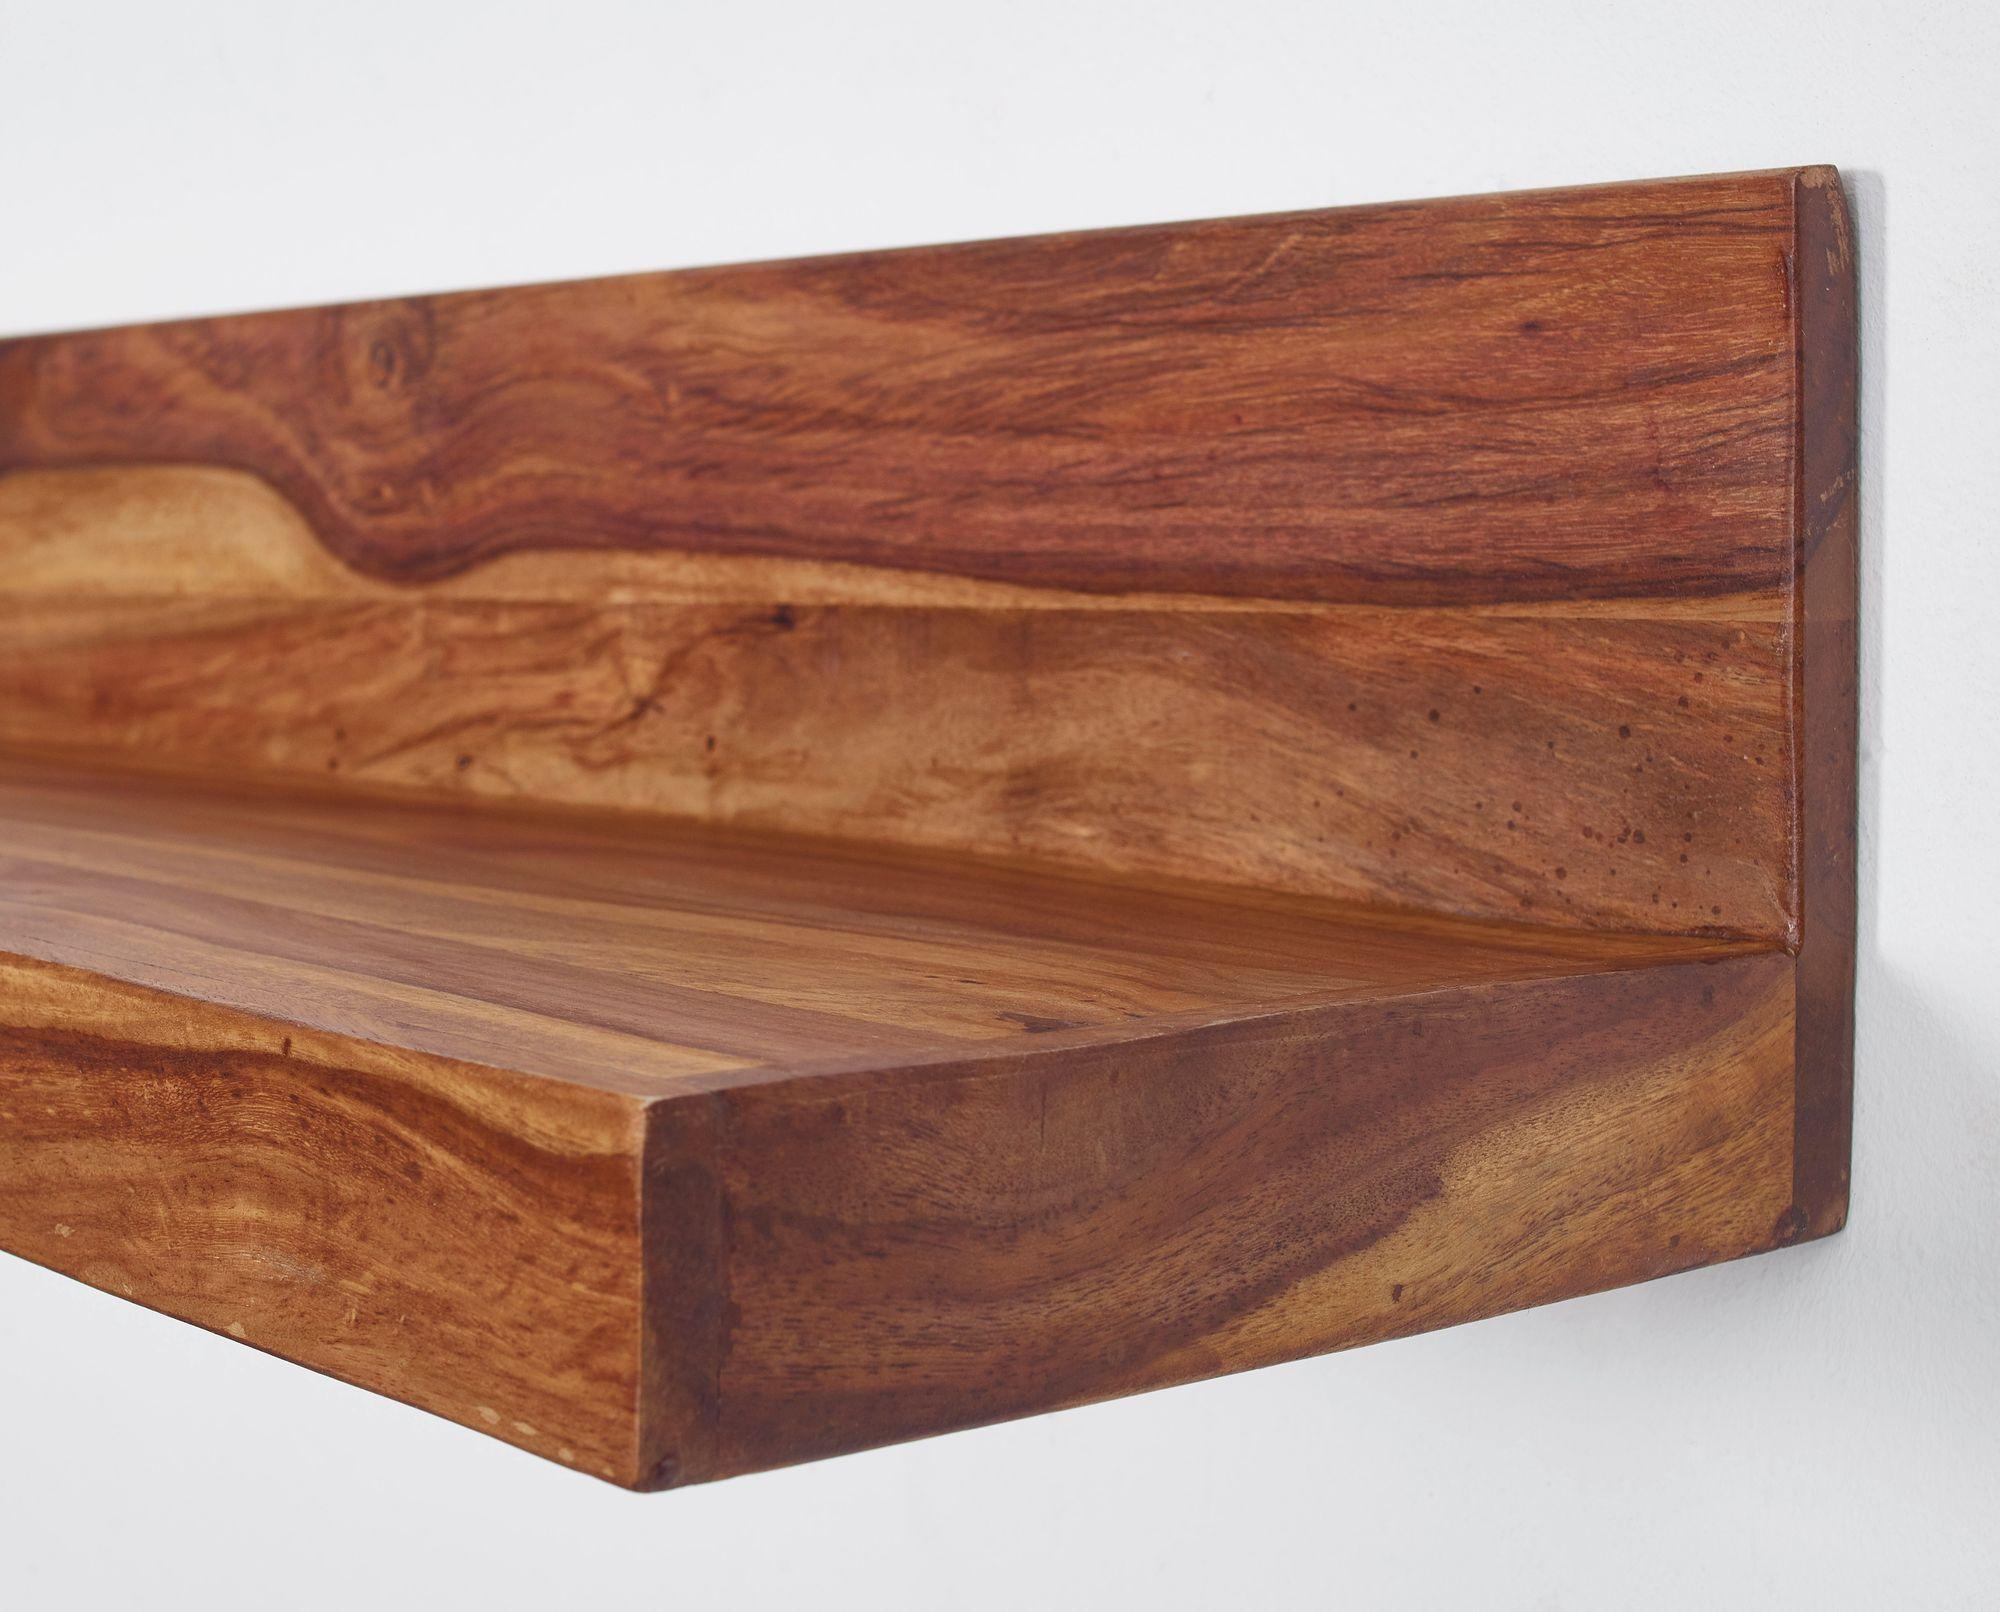 Full Size of Wandregal Mumbai Massiv Holz Sheesham Online Kaufen Regal Kernbuche Schreibtisch Mit String Regale Naturholz Ahorn Günstige Kinderzimmer Kanban Landhausstil Regal Regal Naturholz